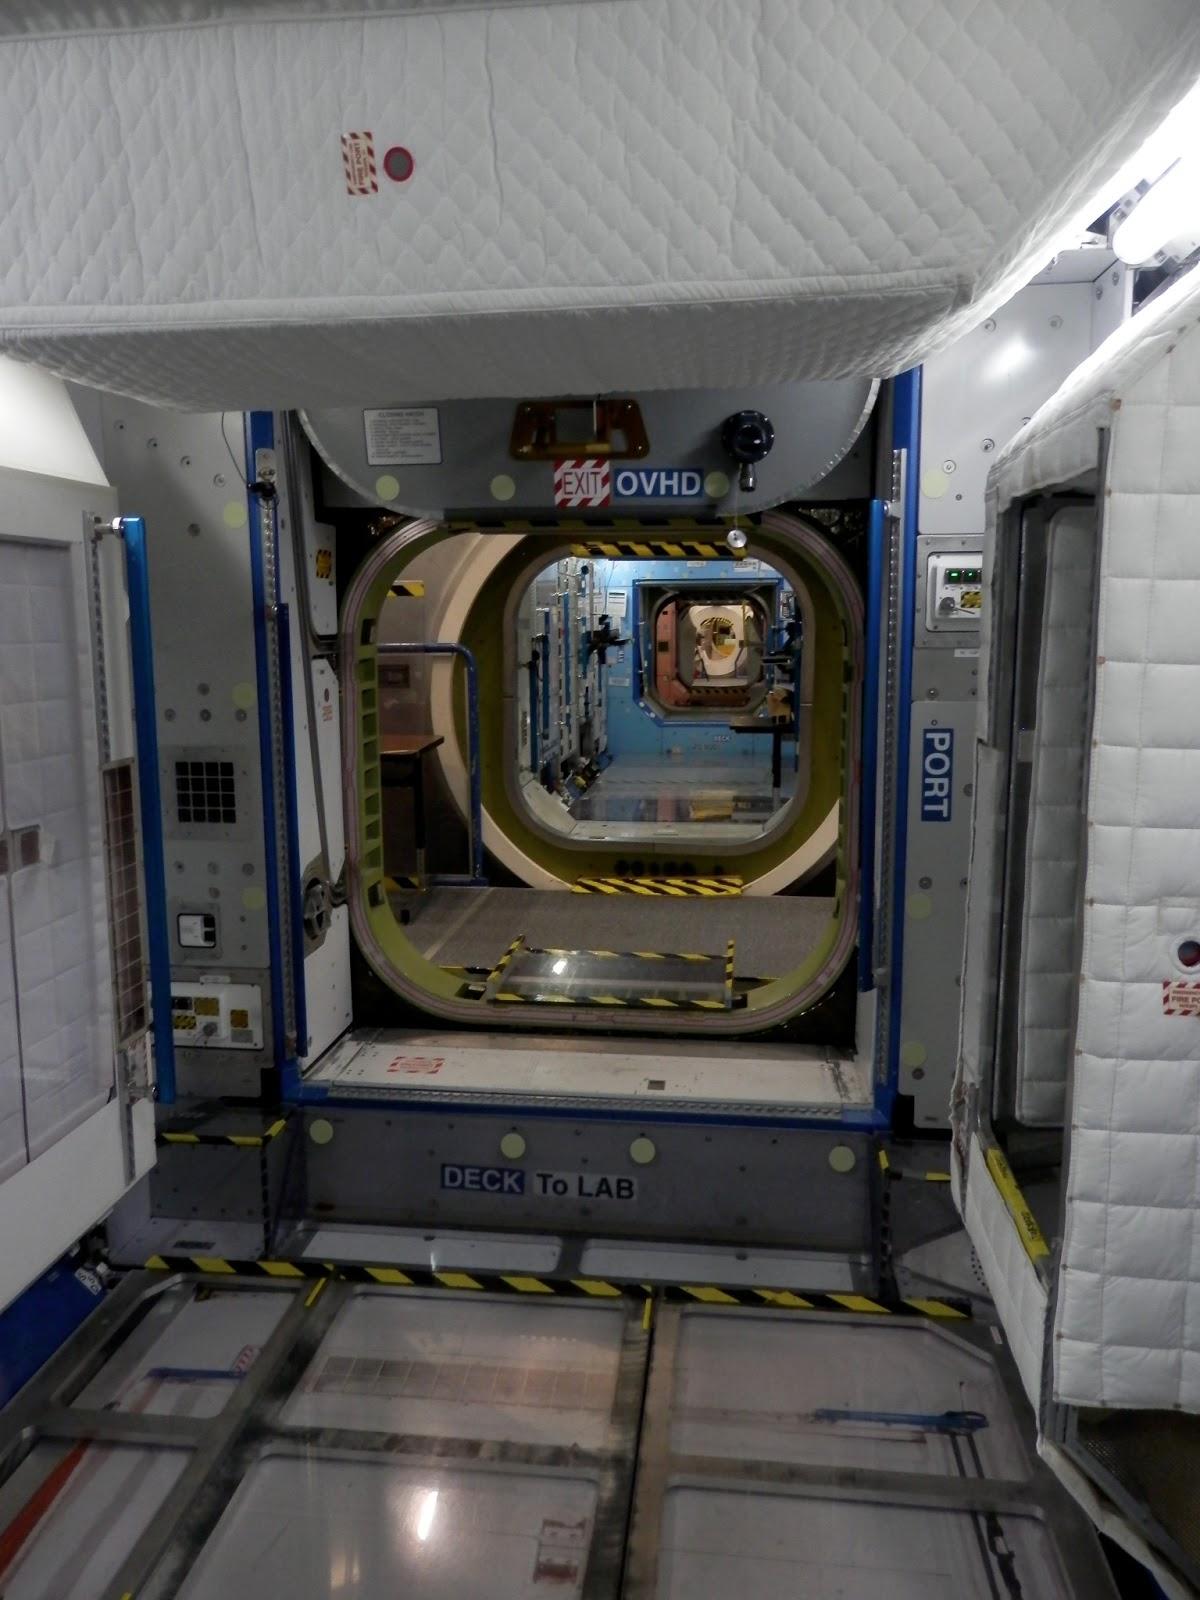 astronauts sleeping compartment - photo #22